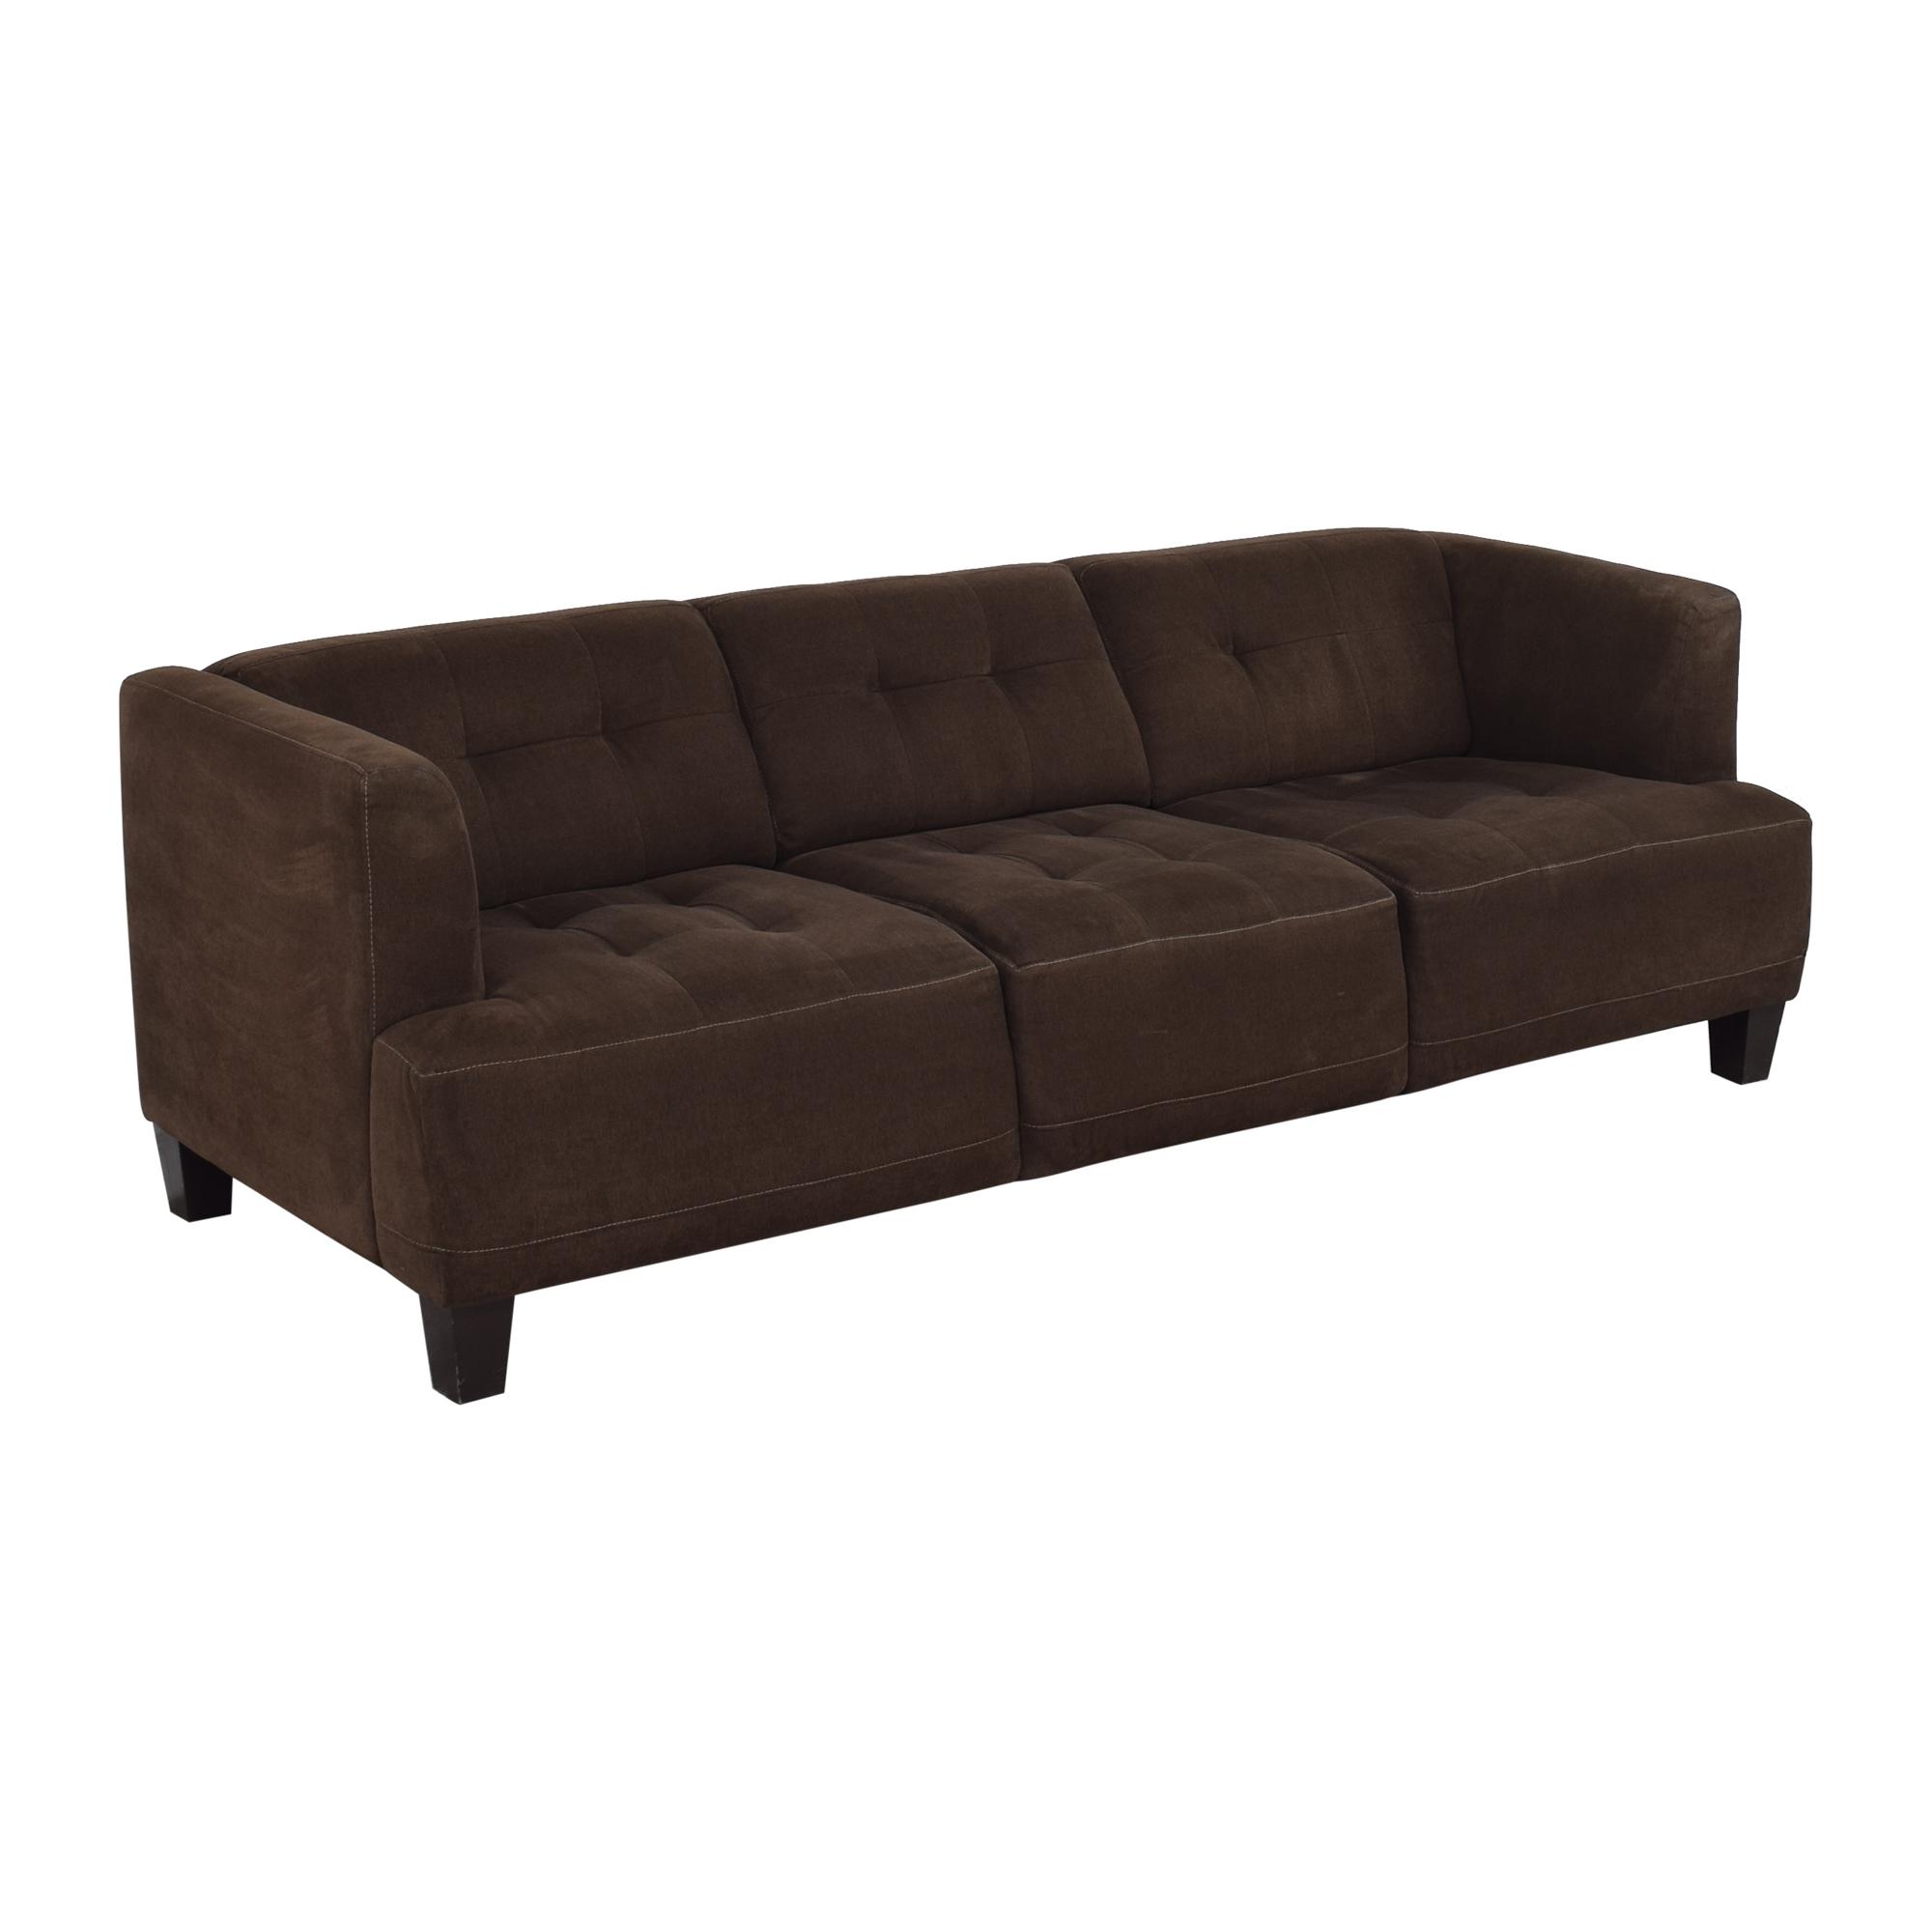 shop Macy's Macy's Jonathan Louis Three Cushion Sofa online